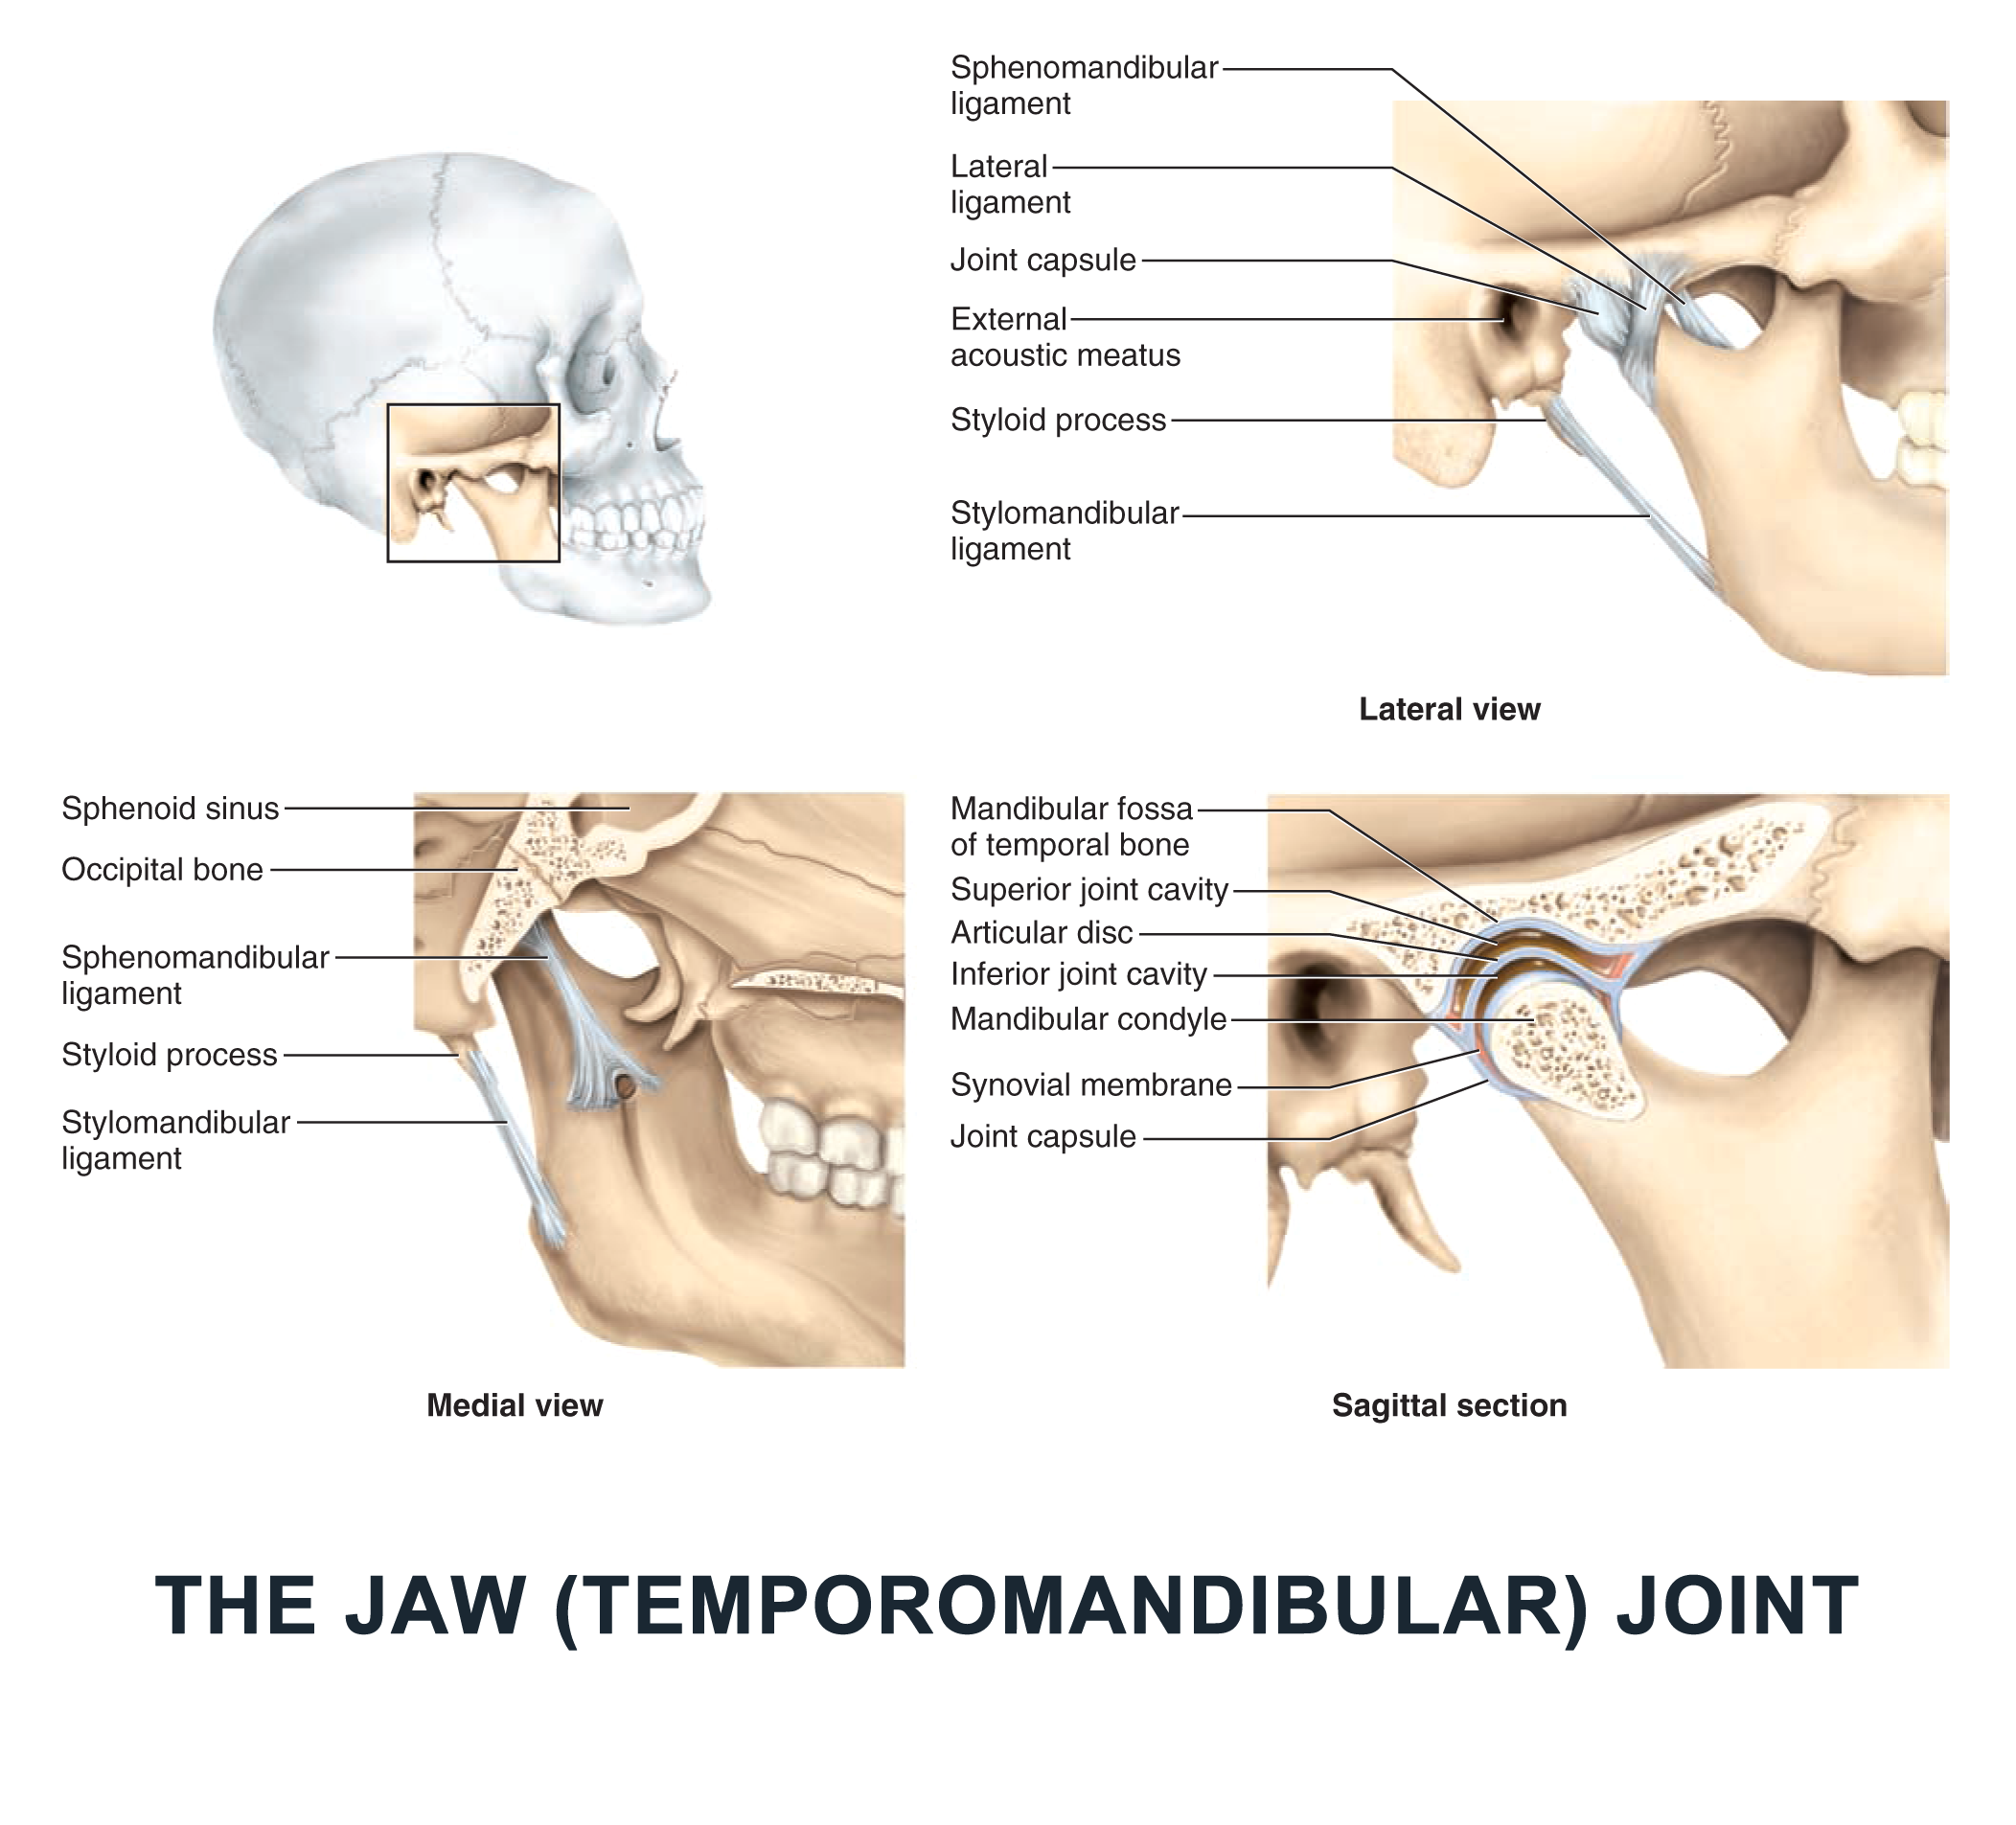 medium resolution of the jaw temporomandibular joint anatomy images illustrations anatomy images character design